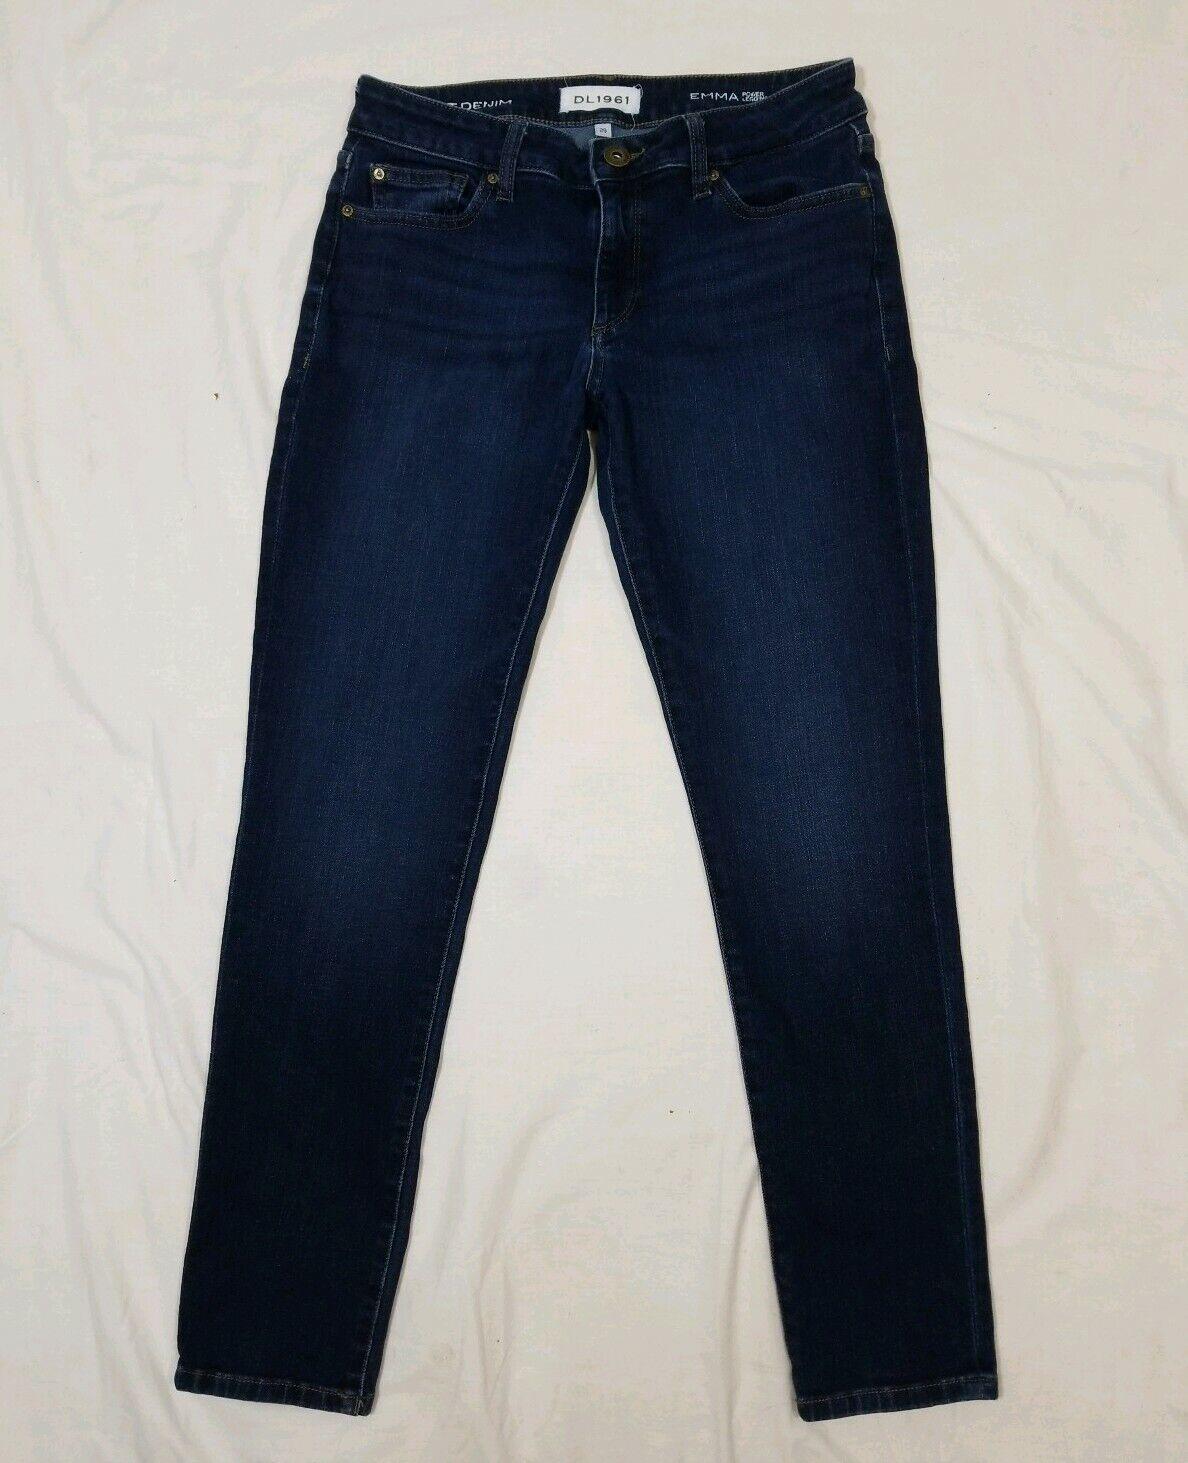 DL 1961 Dark Wash Smart Denim Emma Power Leggings Skinny Stretch Jeans 29x28.5